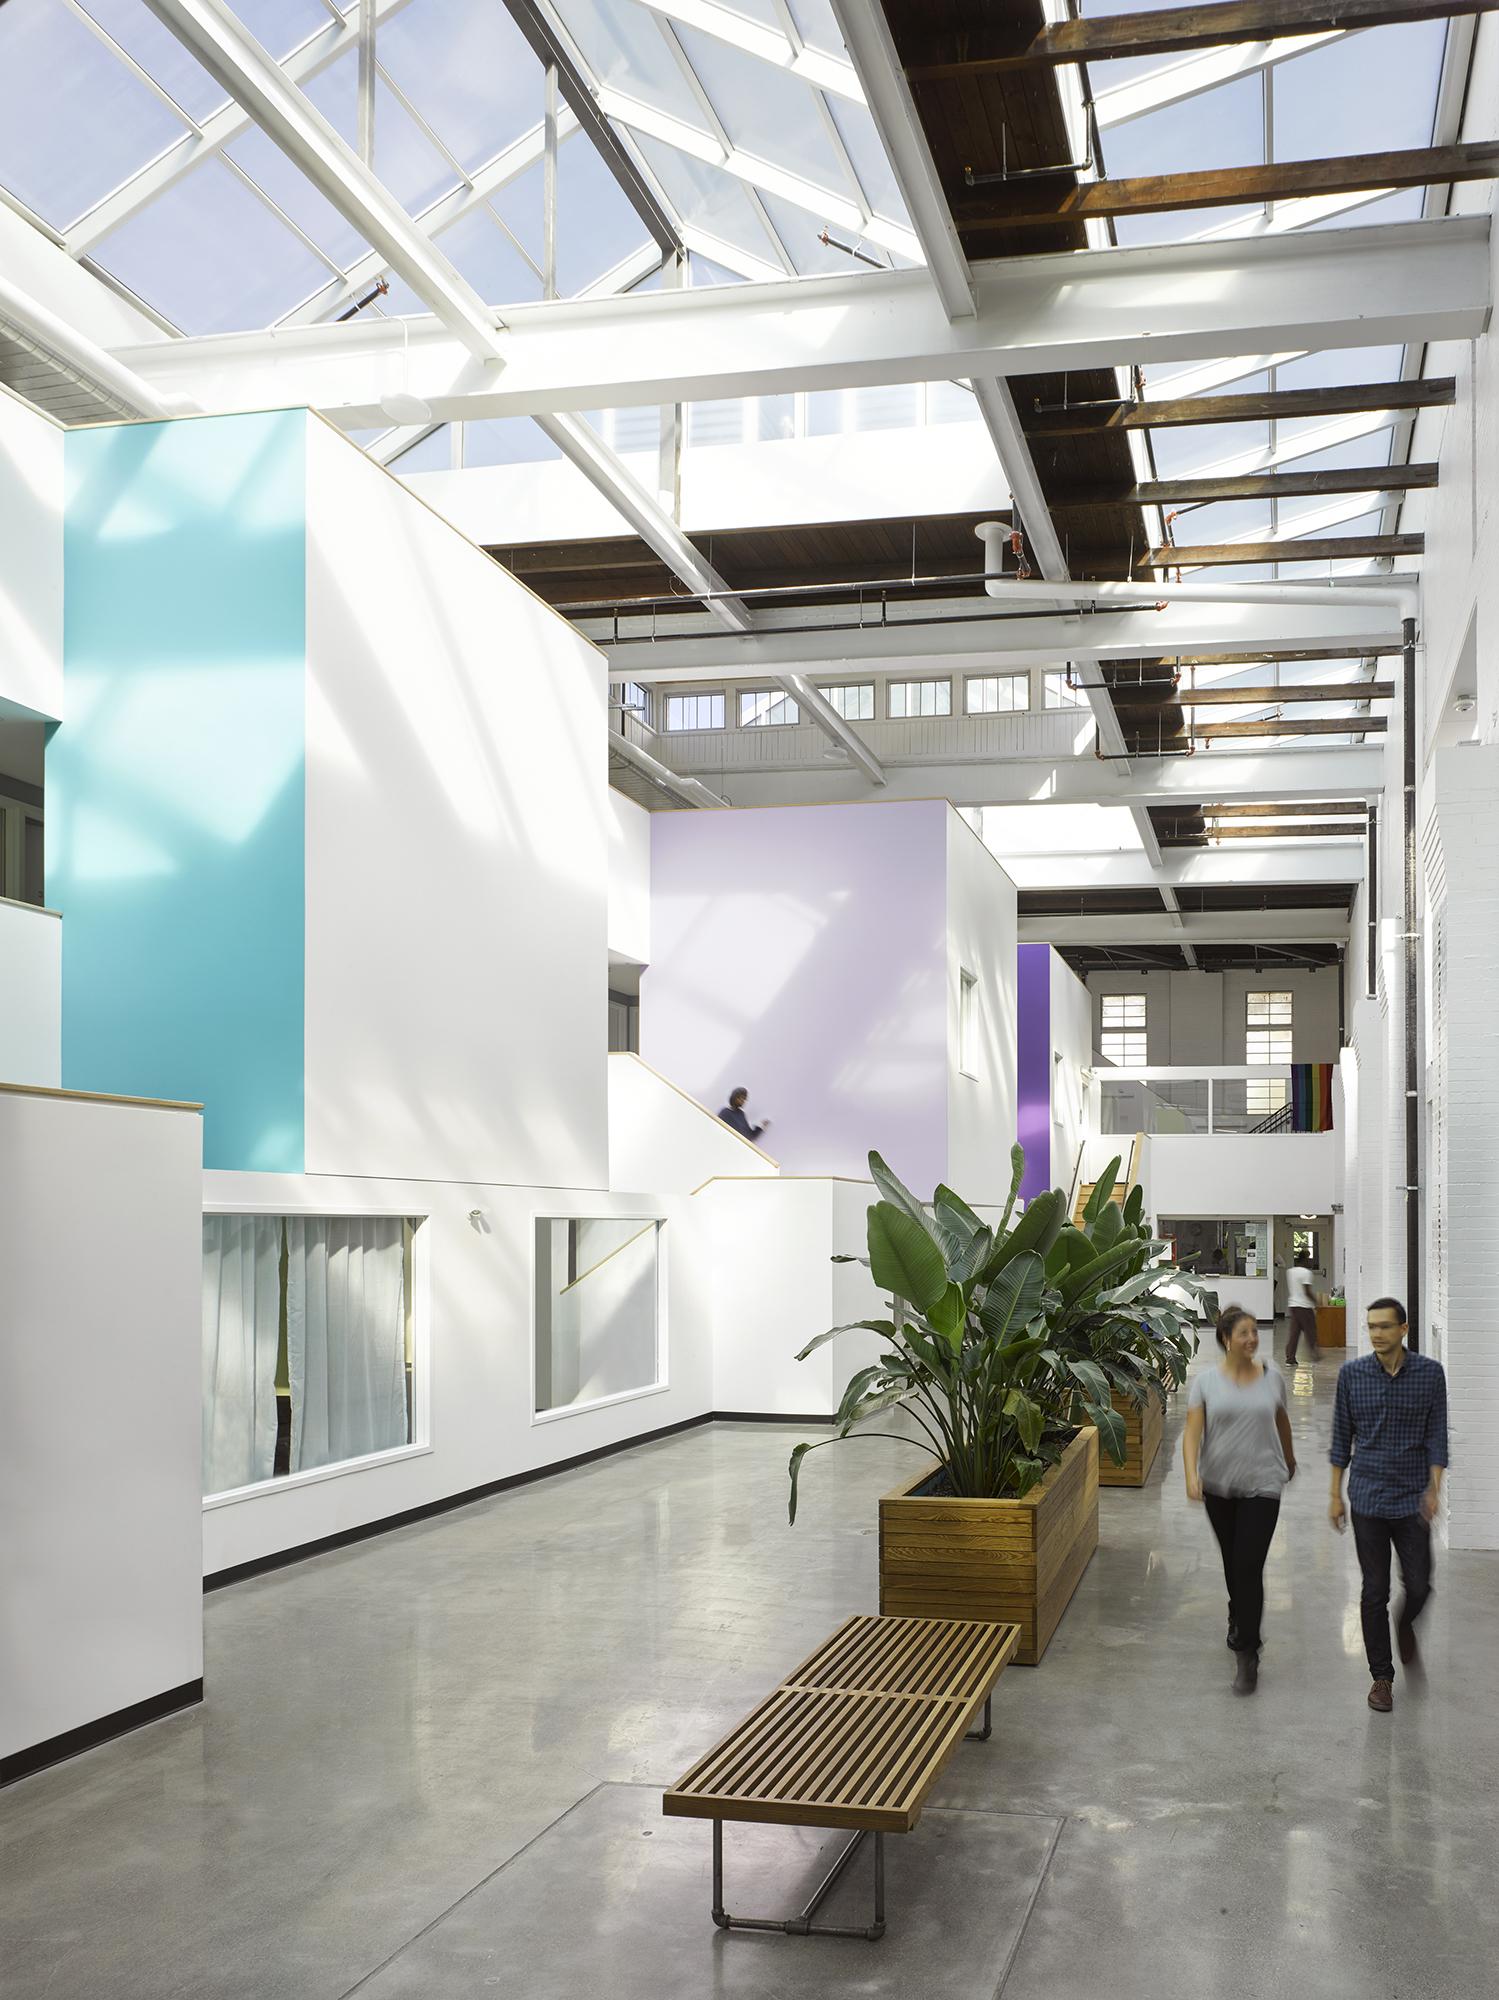 A Neighborhood within a Building — XXI Magazine